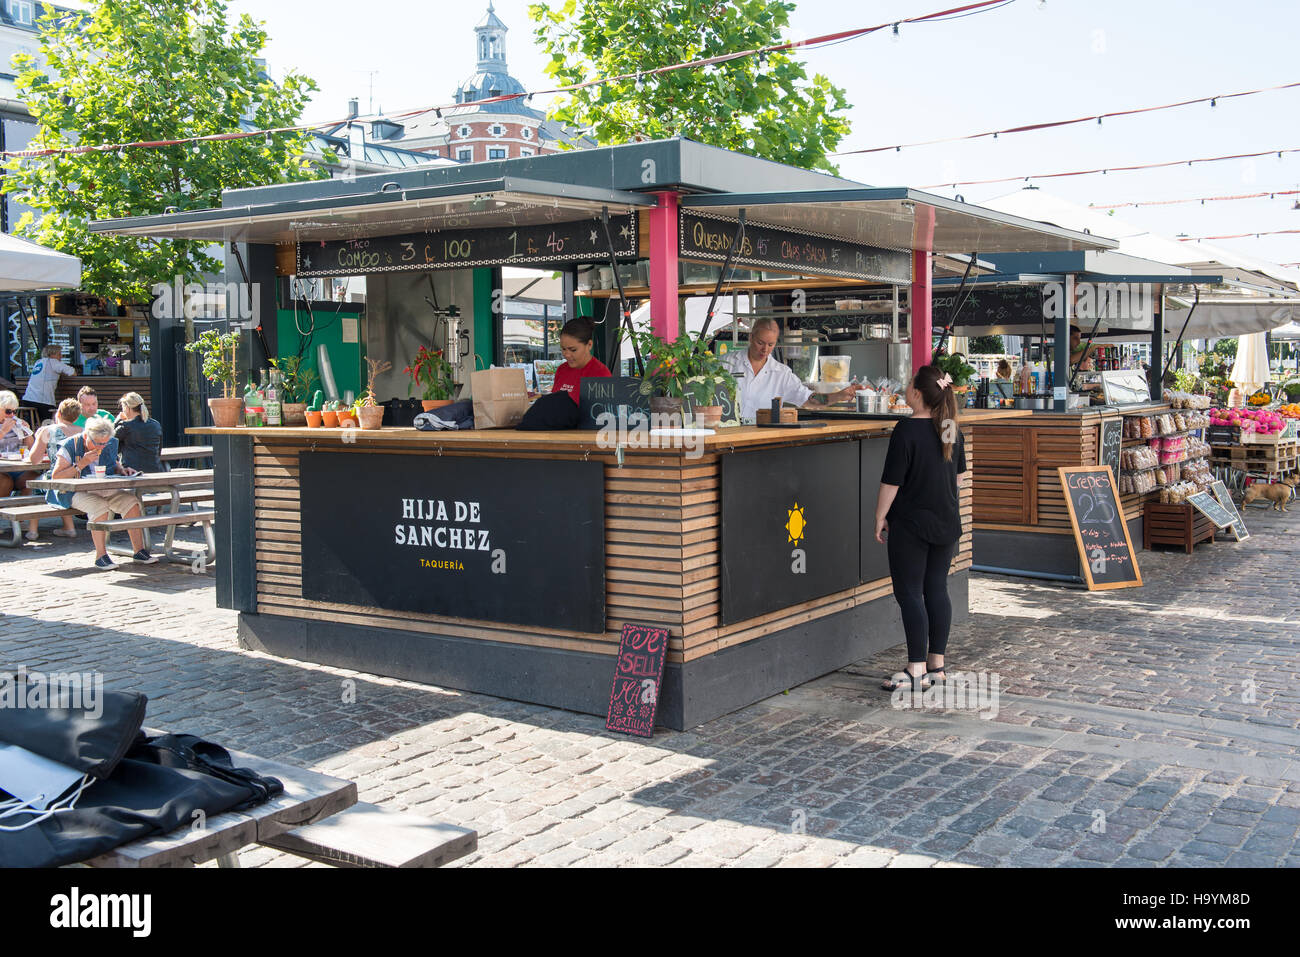 Hijas de sanchez Restaurante como parte de torvehallerne en Copenhague, Dinamarca Imagen De Stock